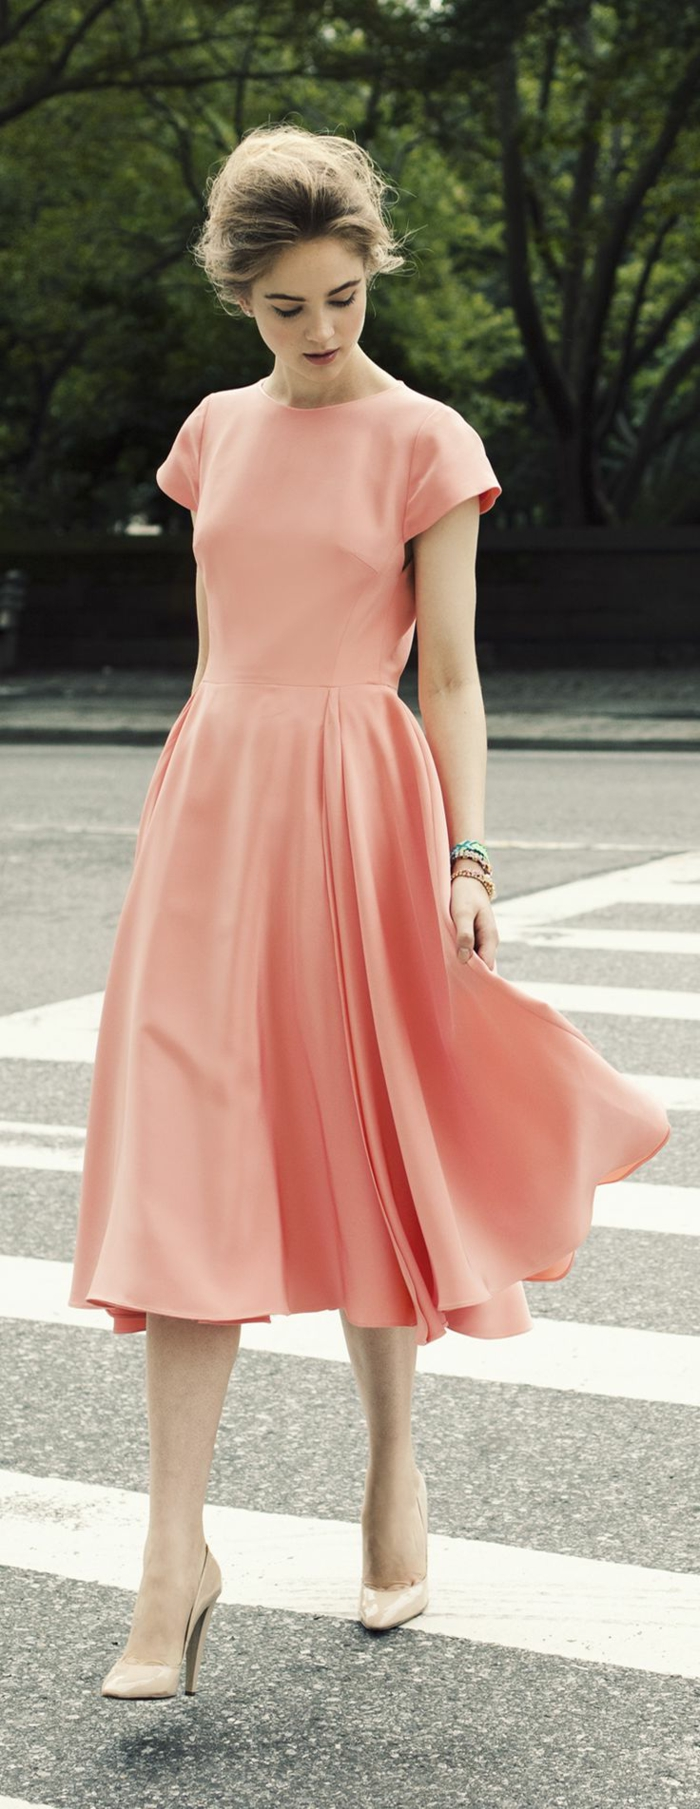 1-joile-robe-ete-rose-femme-march-sur-la-rue-robe-rose-femme-tendance